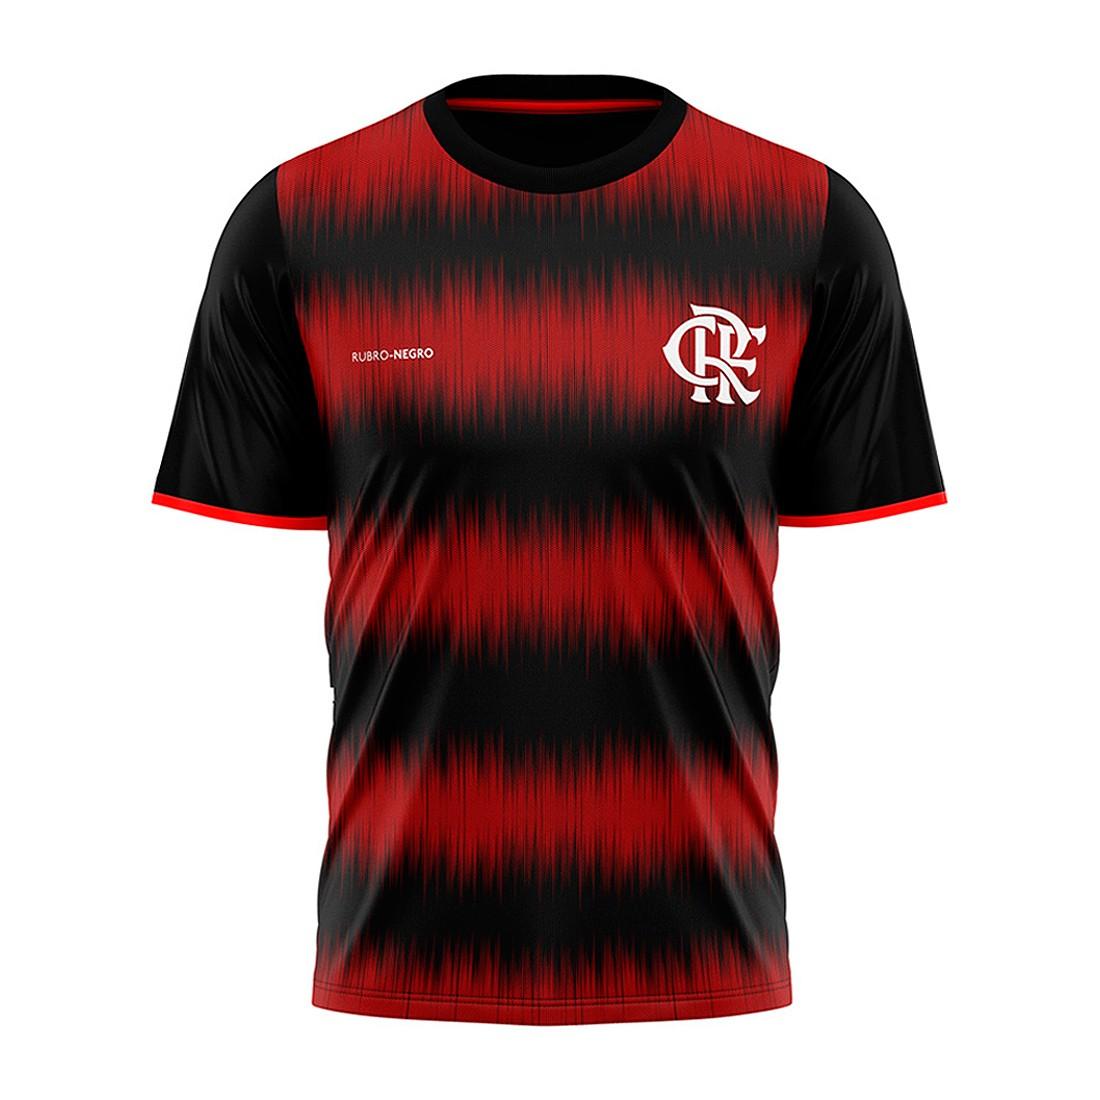 Camisa Flamengo Batimento Rubro-Negro